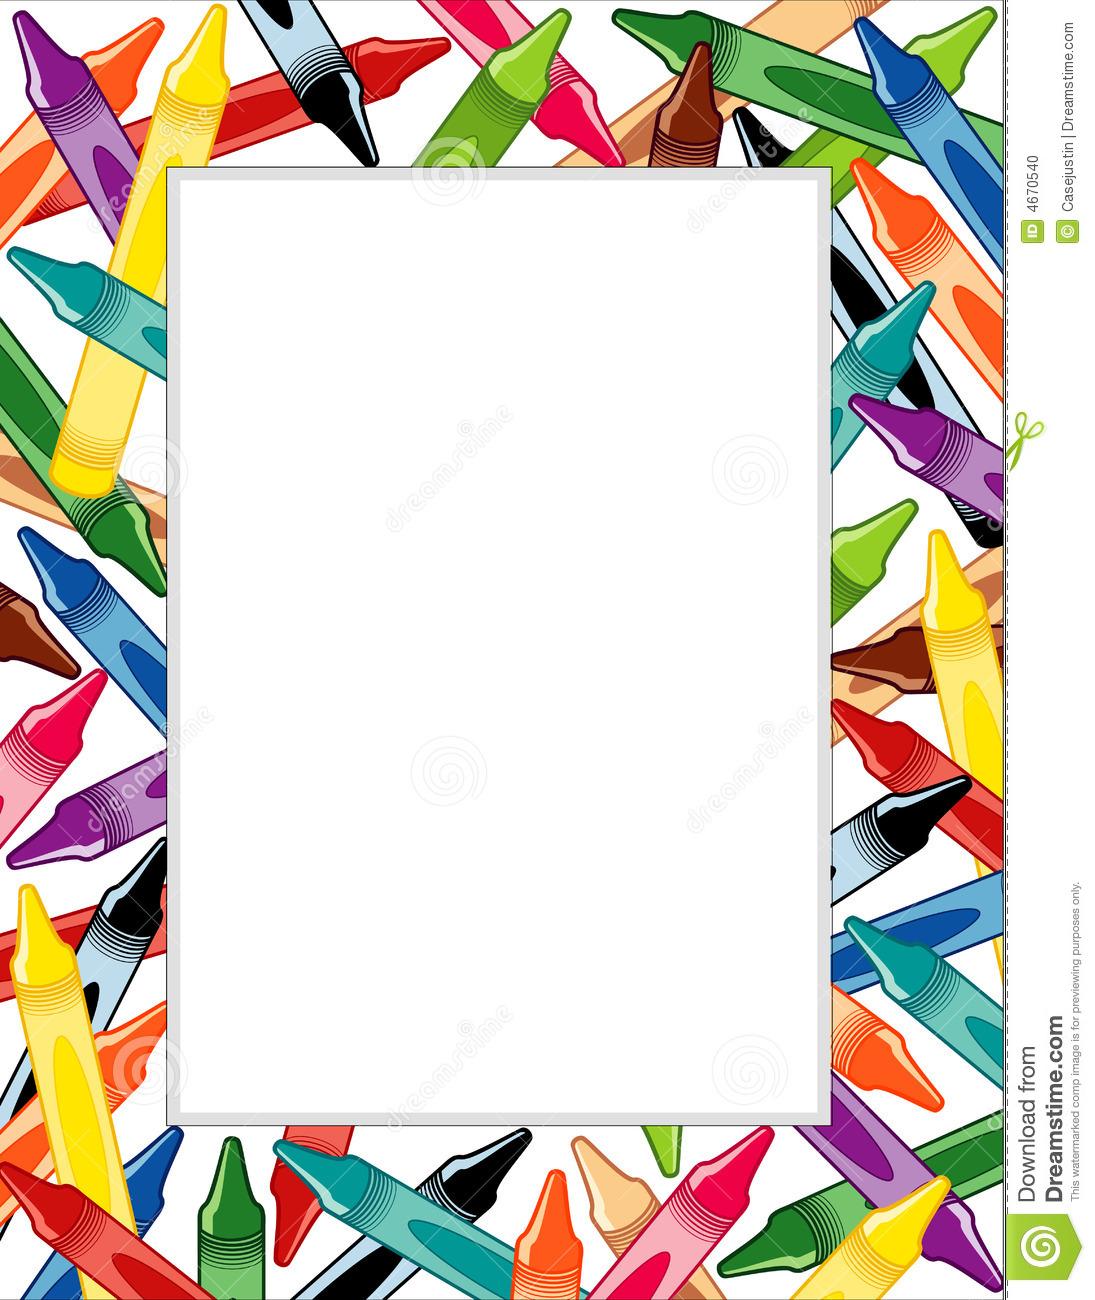 Crayon Border Clipart - Clipart Suggest